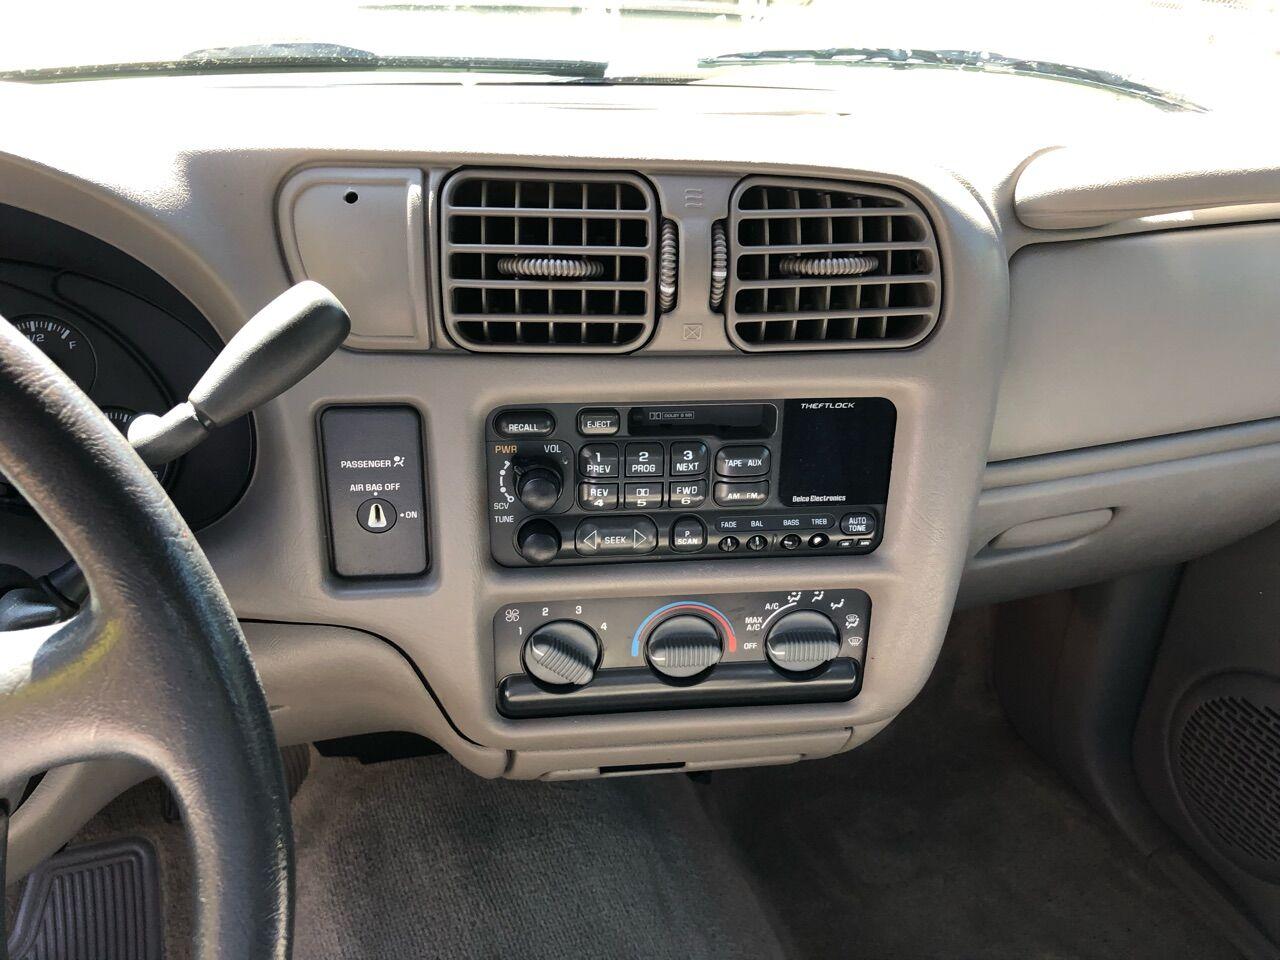 1998 Chevrolet S-10 Standard Bed